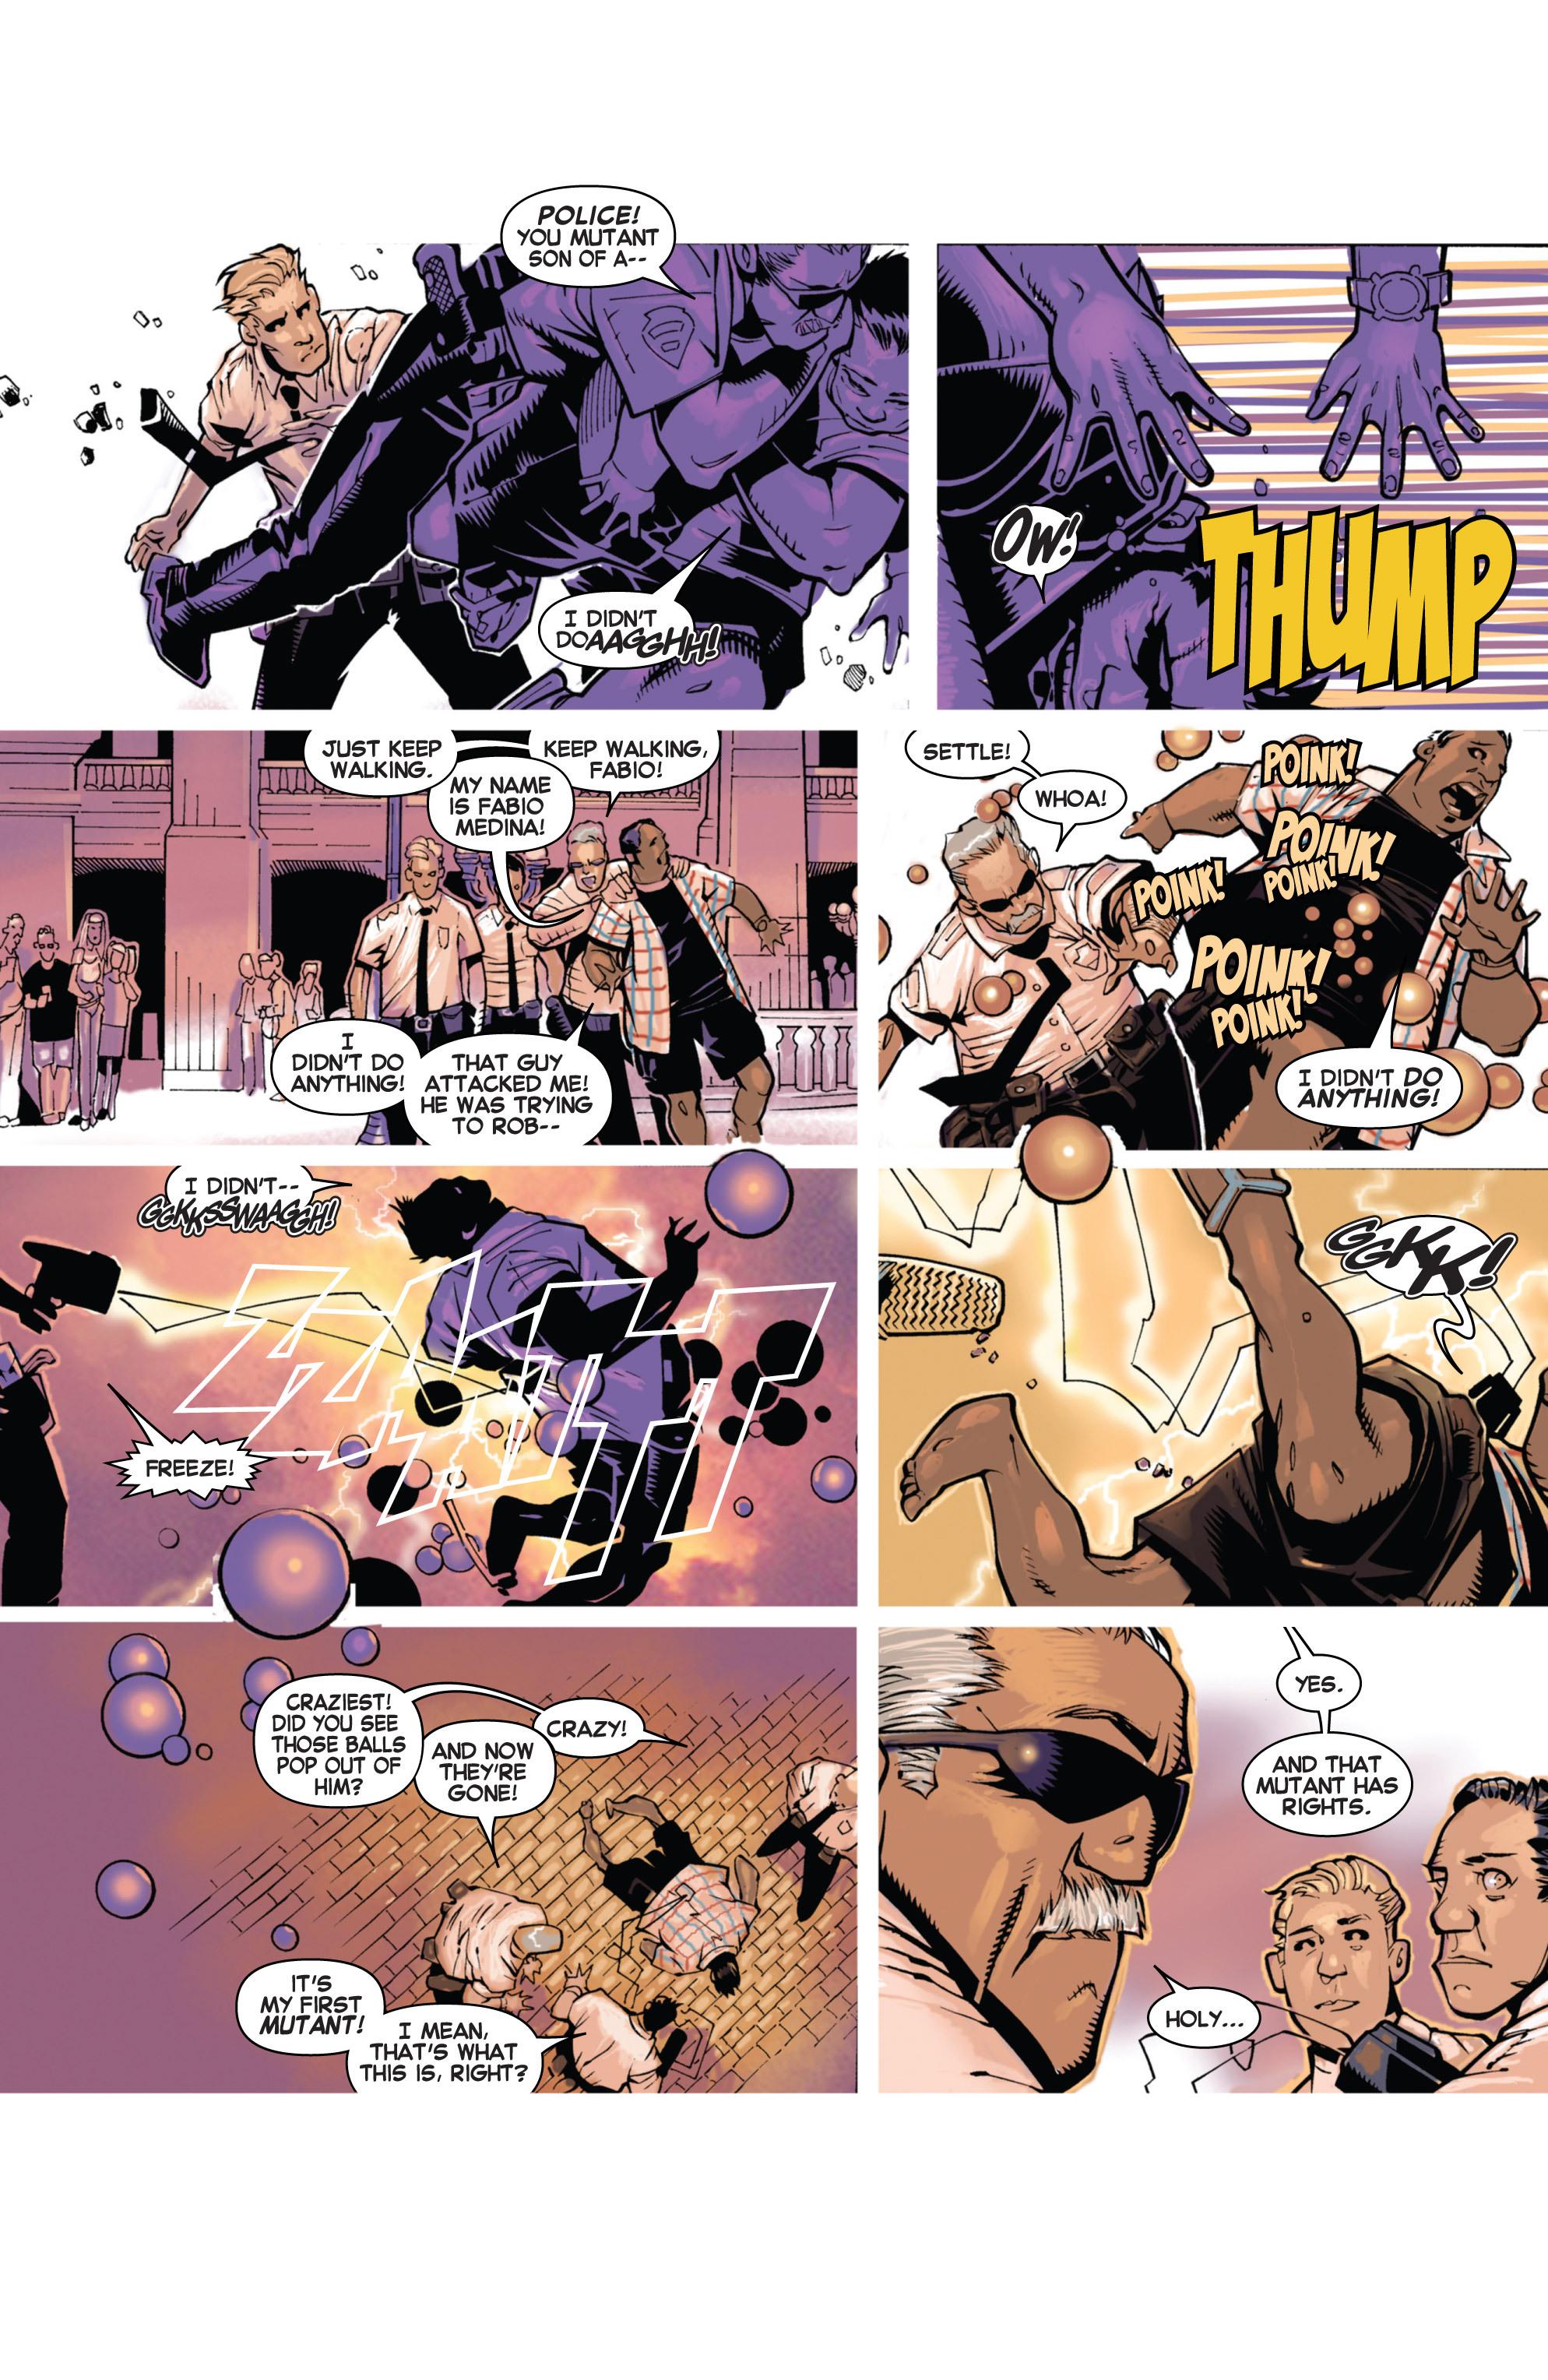 Read online Uncanny X-Men (2013) comic -  Issue # _TPB 1 - Revolution - 12